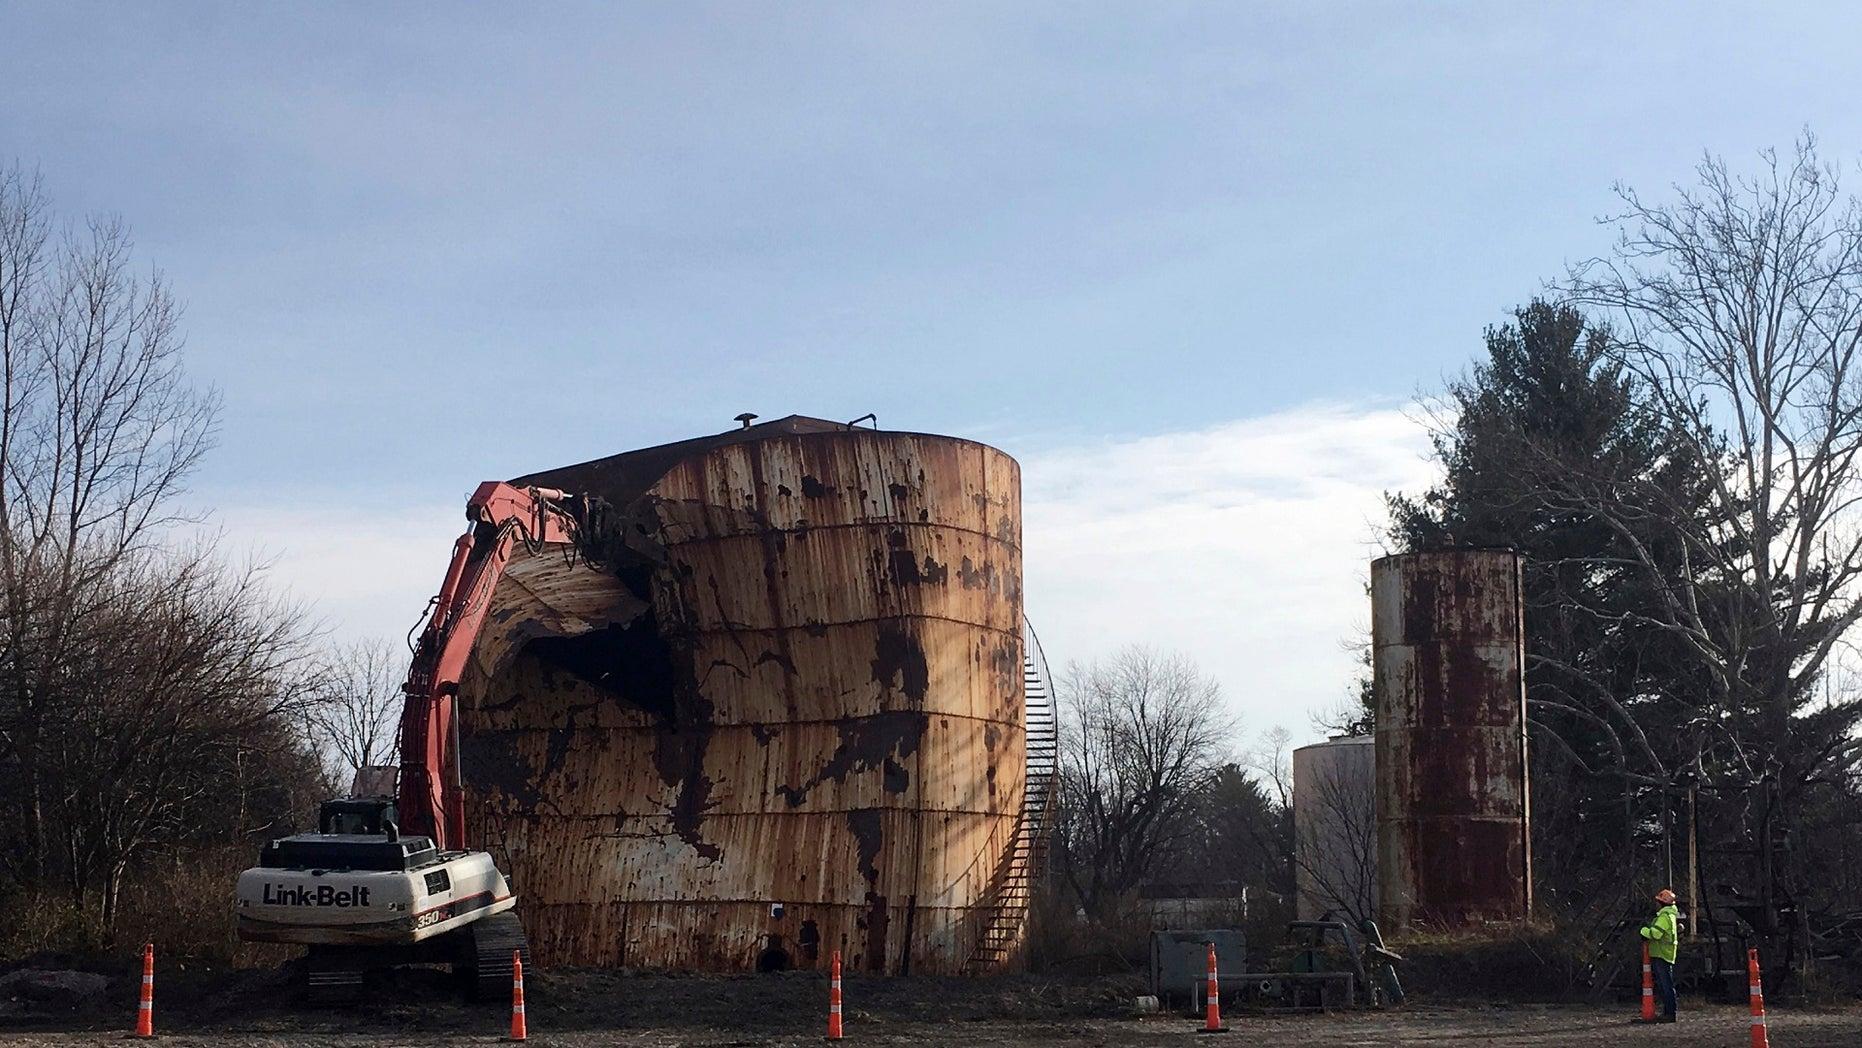 A tank at a Kiel Bros. property is torn down in Indianapolis, Dec. 11, 2017.